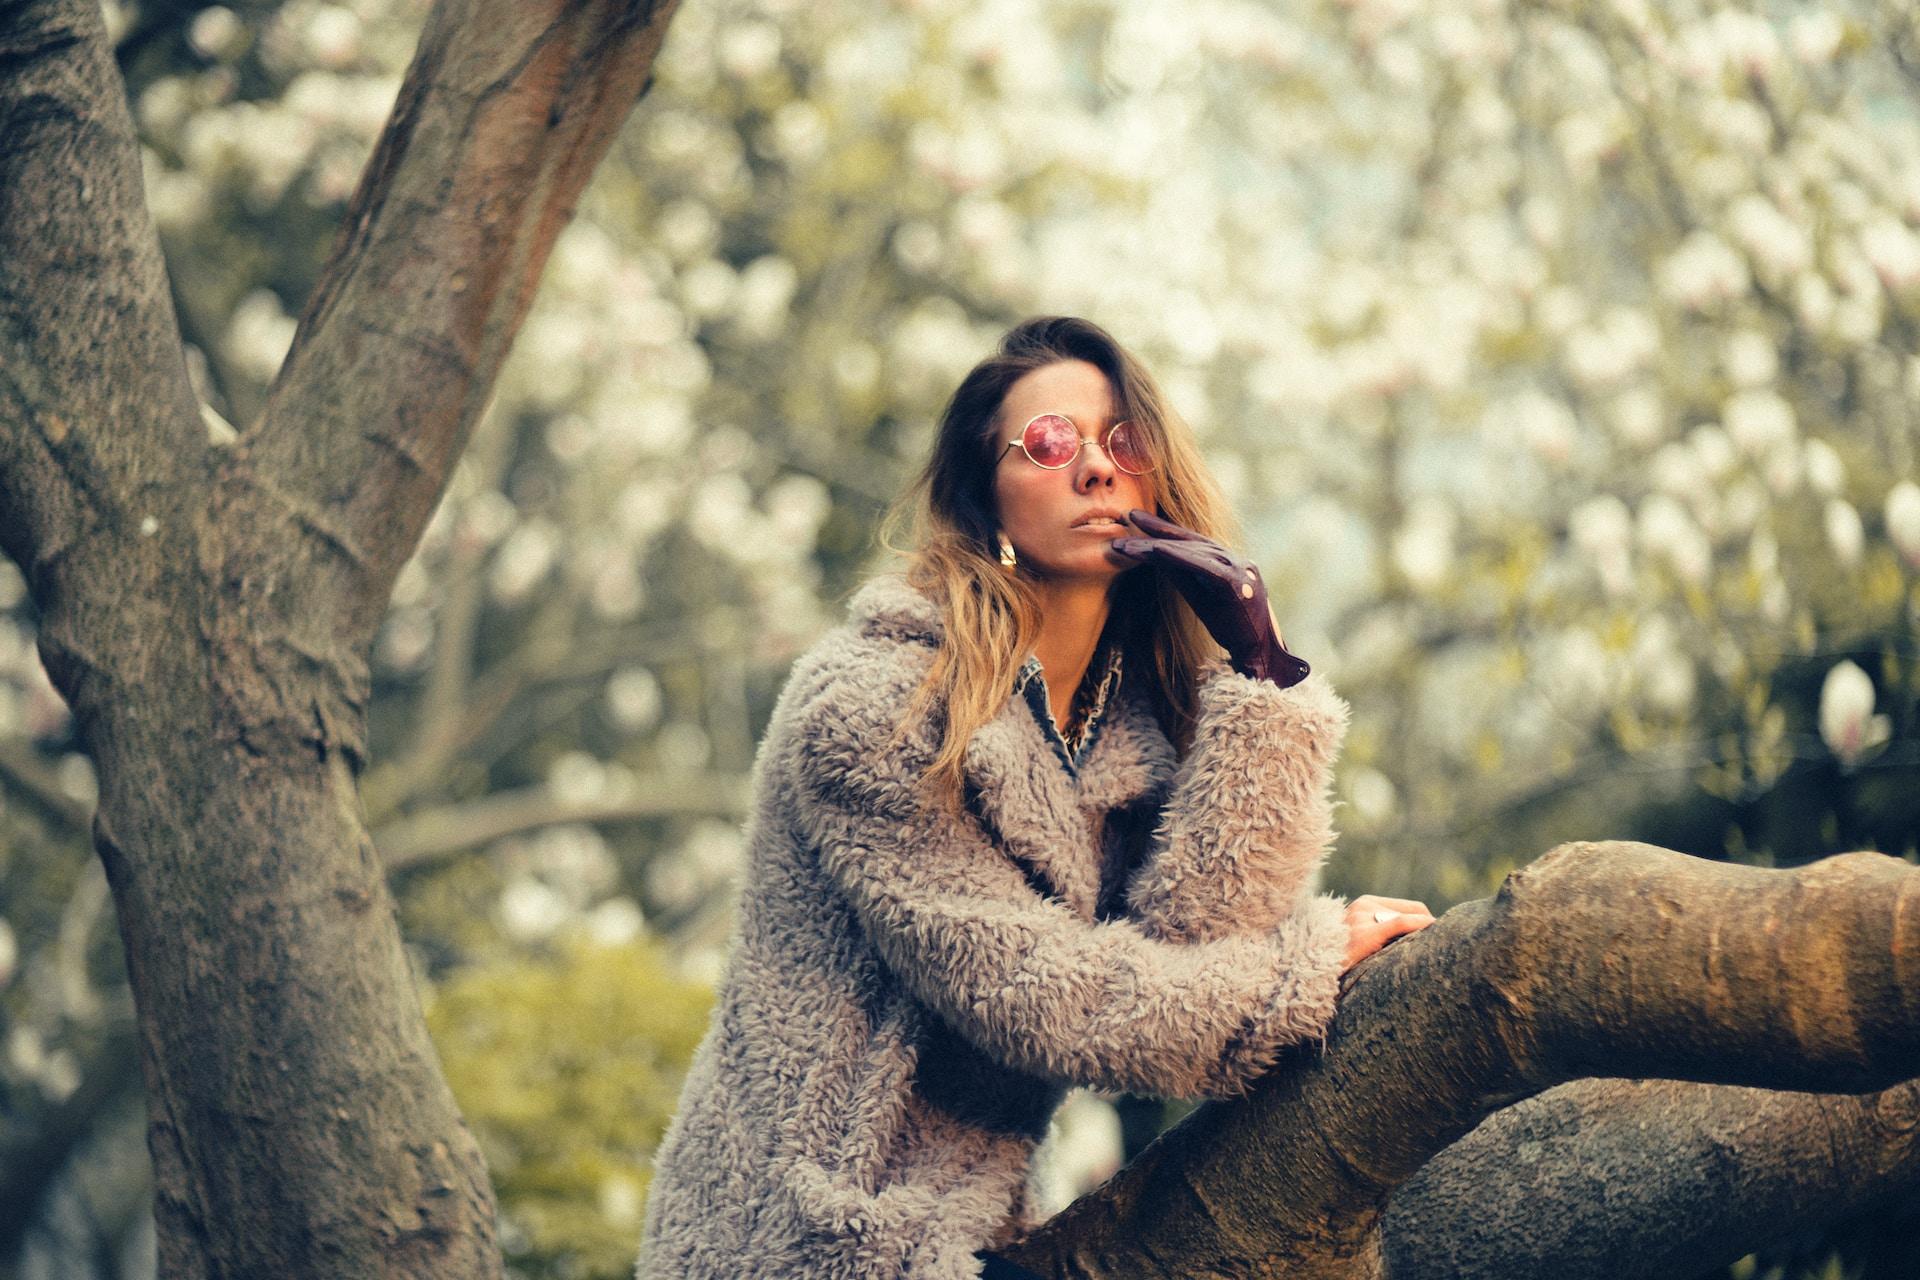 woman in gray coat sitting on tree stem